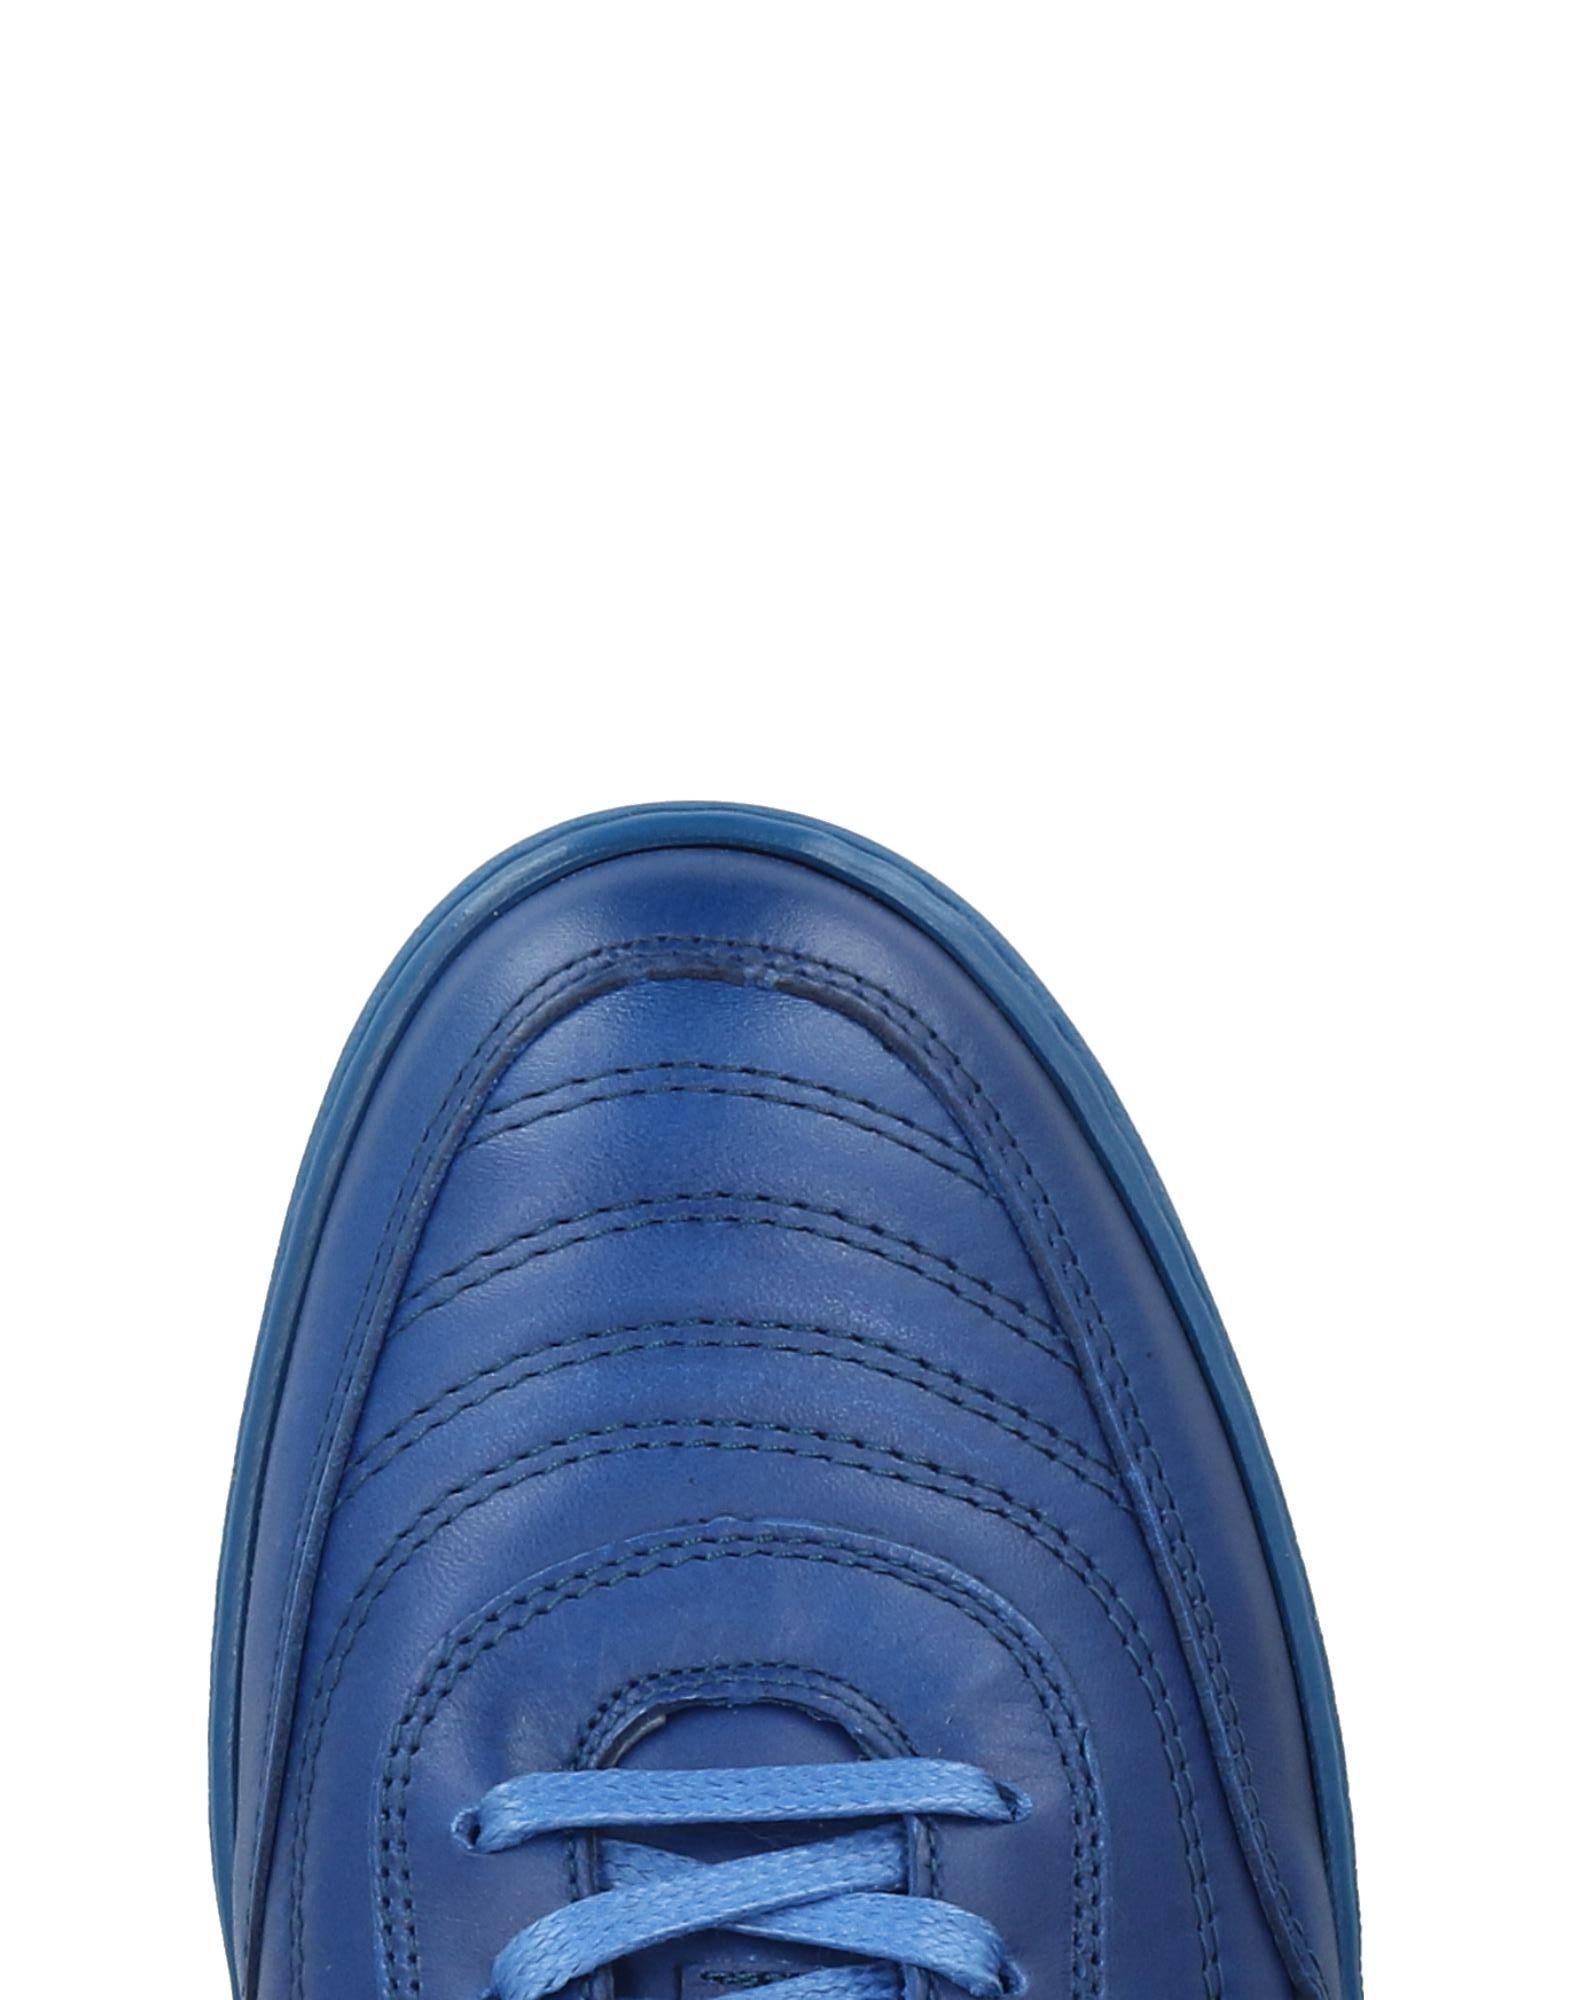 Sneakers Pantofola D'oro Uomo Uomo D'oro - 11456499ND 5b6b5c